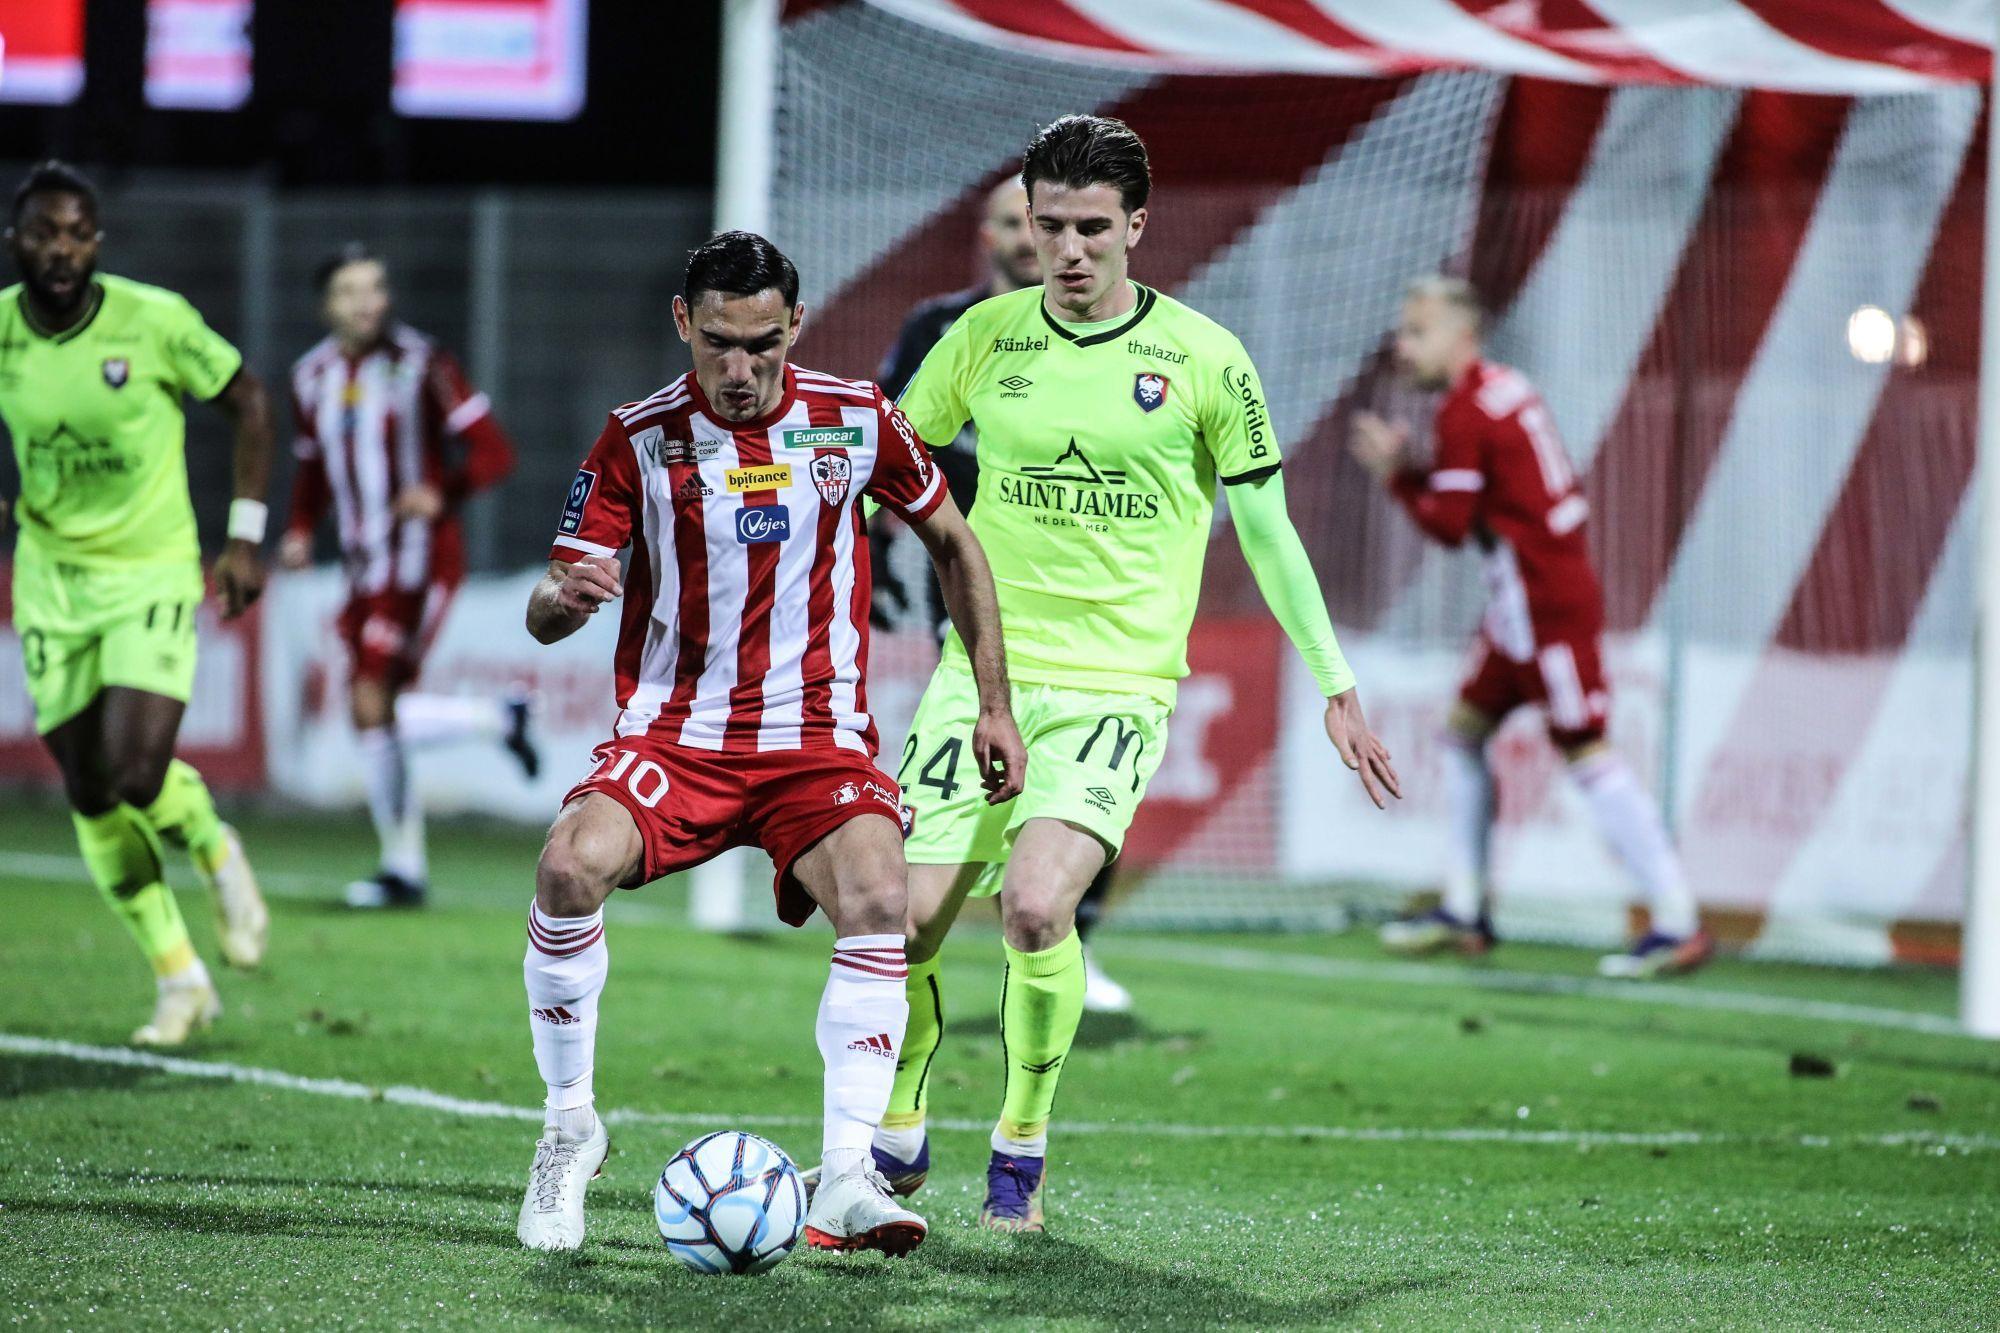 Hugo Vandermersch : « Benjamin Pavard regarde tous mes matchs avec le SM Caen » (Foot Normand)